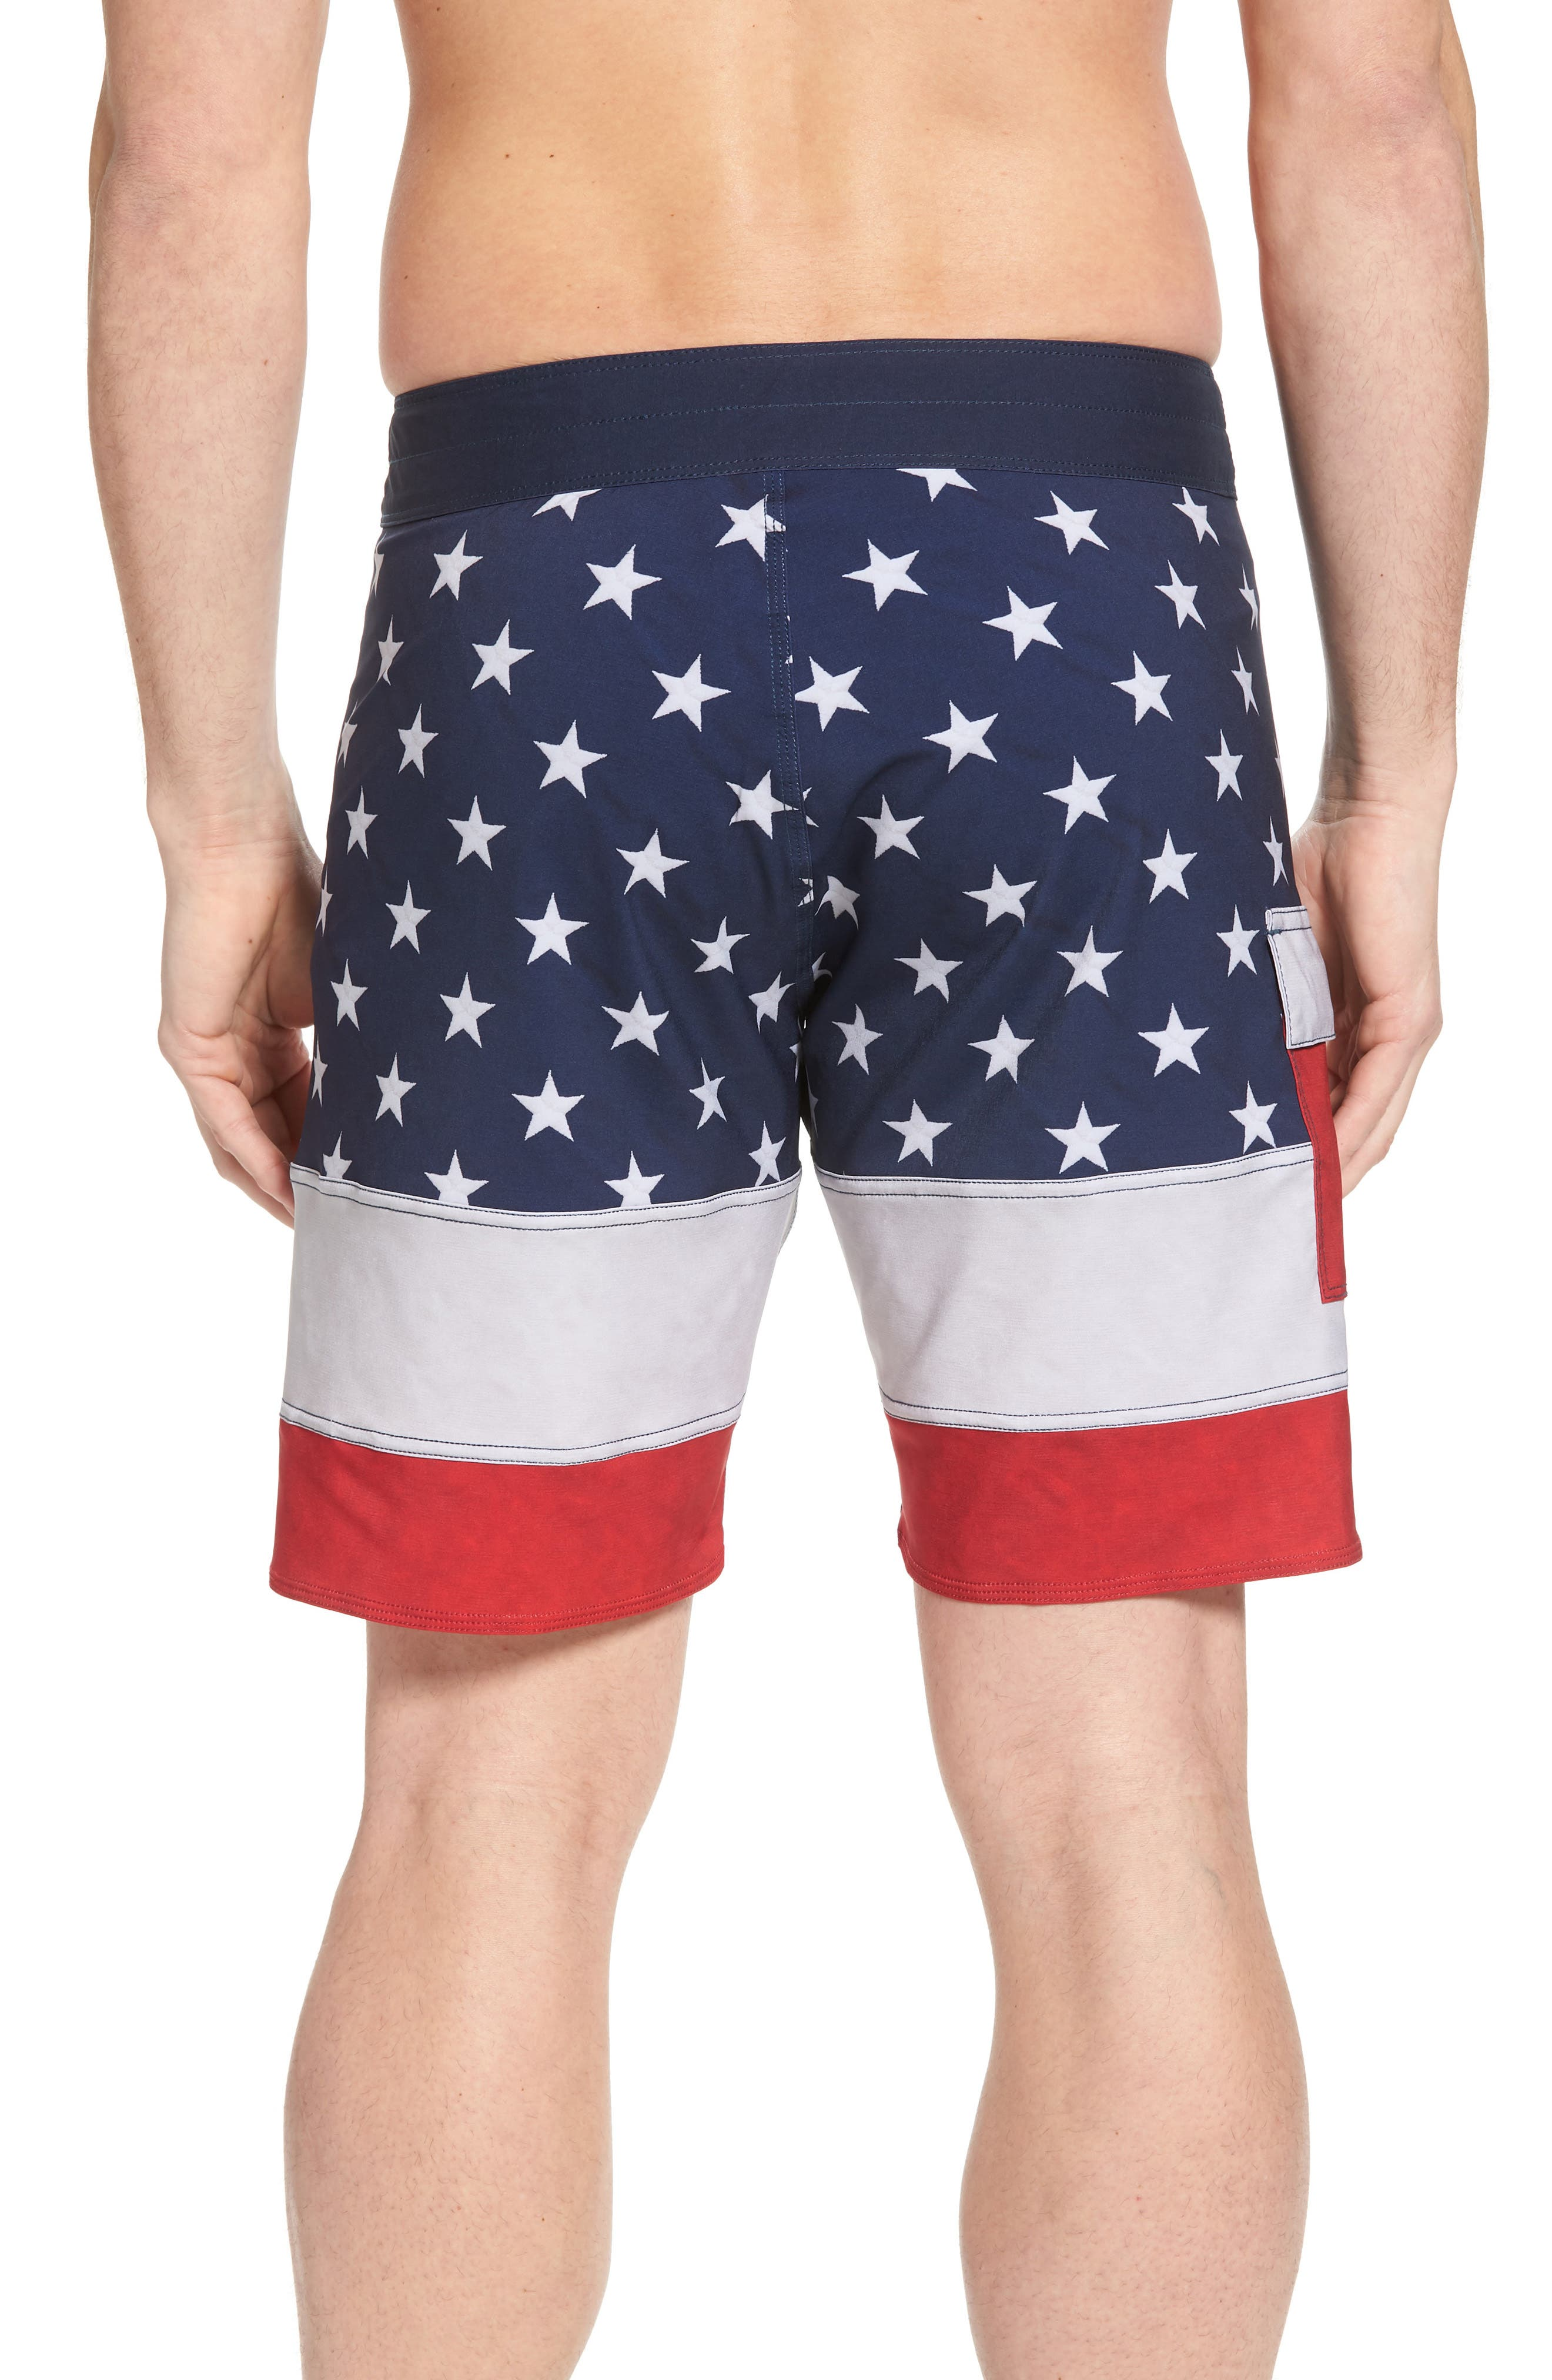 Pump X Board Shorts,                             Alternate thumbnail 2, color,                             400